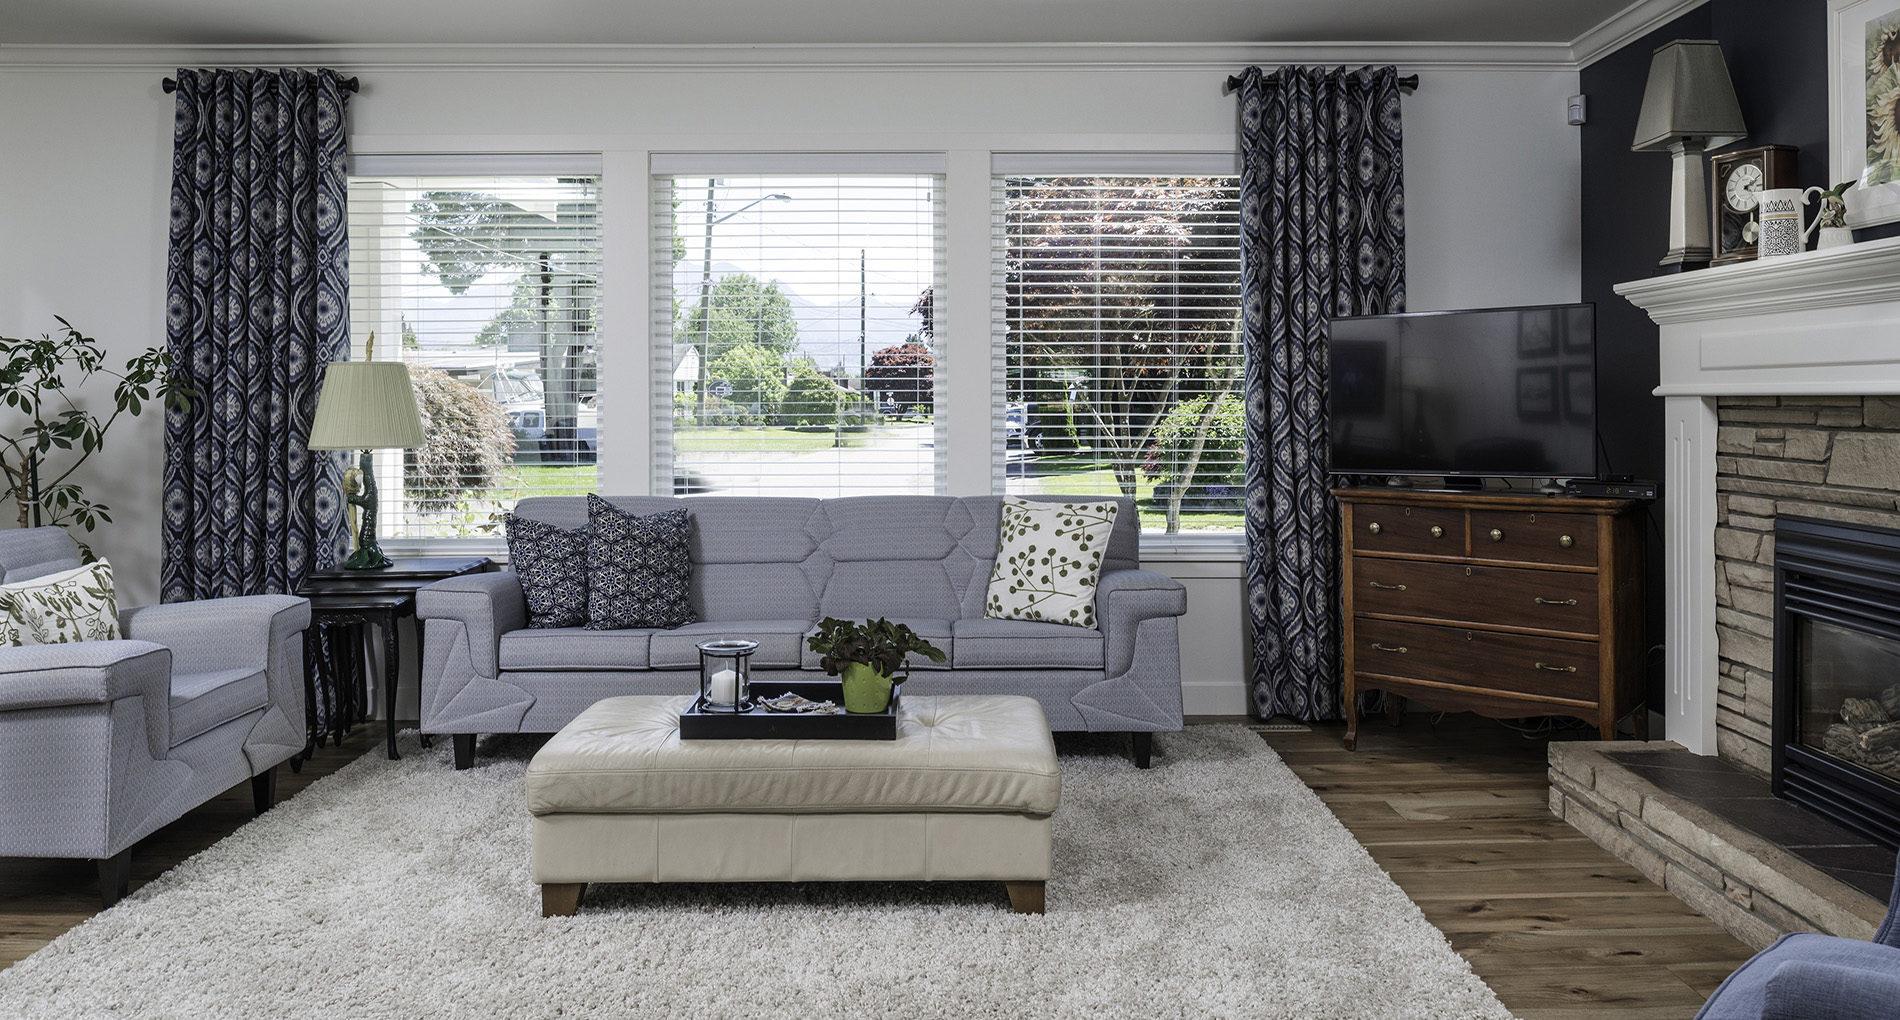 Home Renovation Kelowna Inglewoodcrescent Slider2